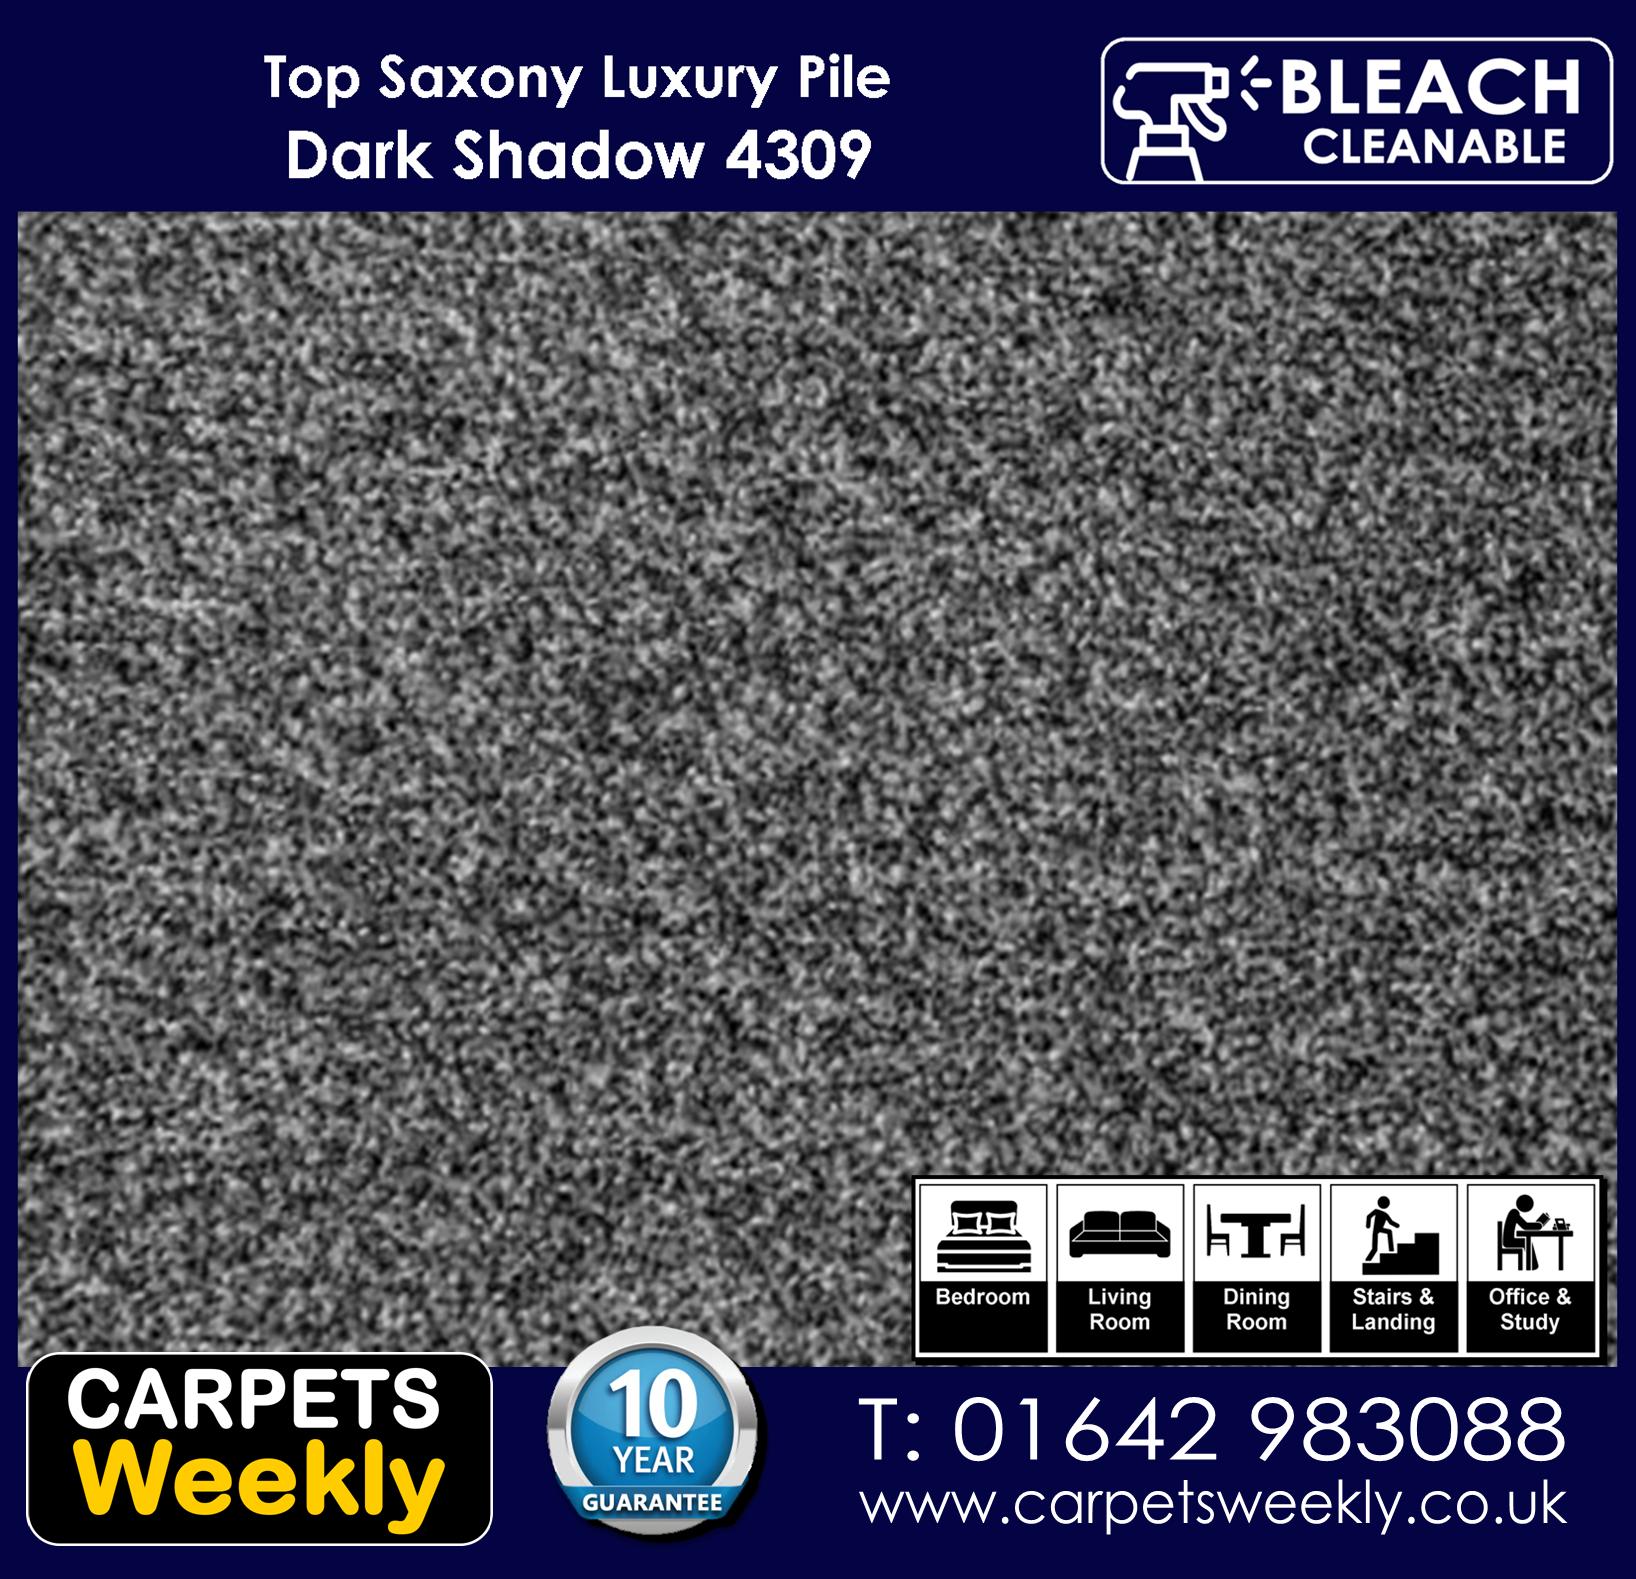 Top Saxony Dark Shadow - 4309 Carpets Weekly